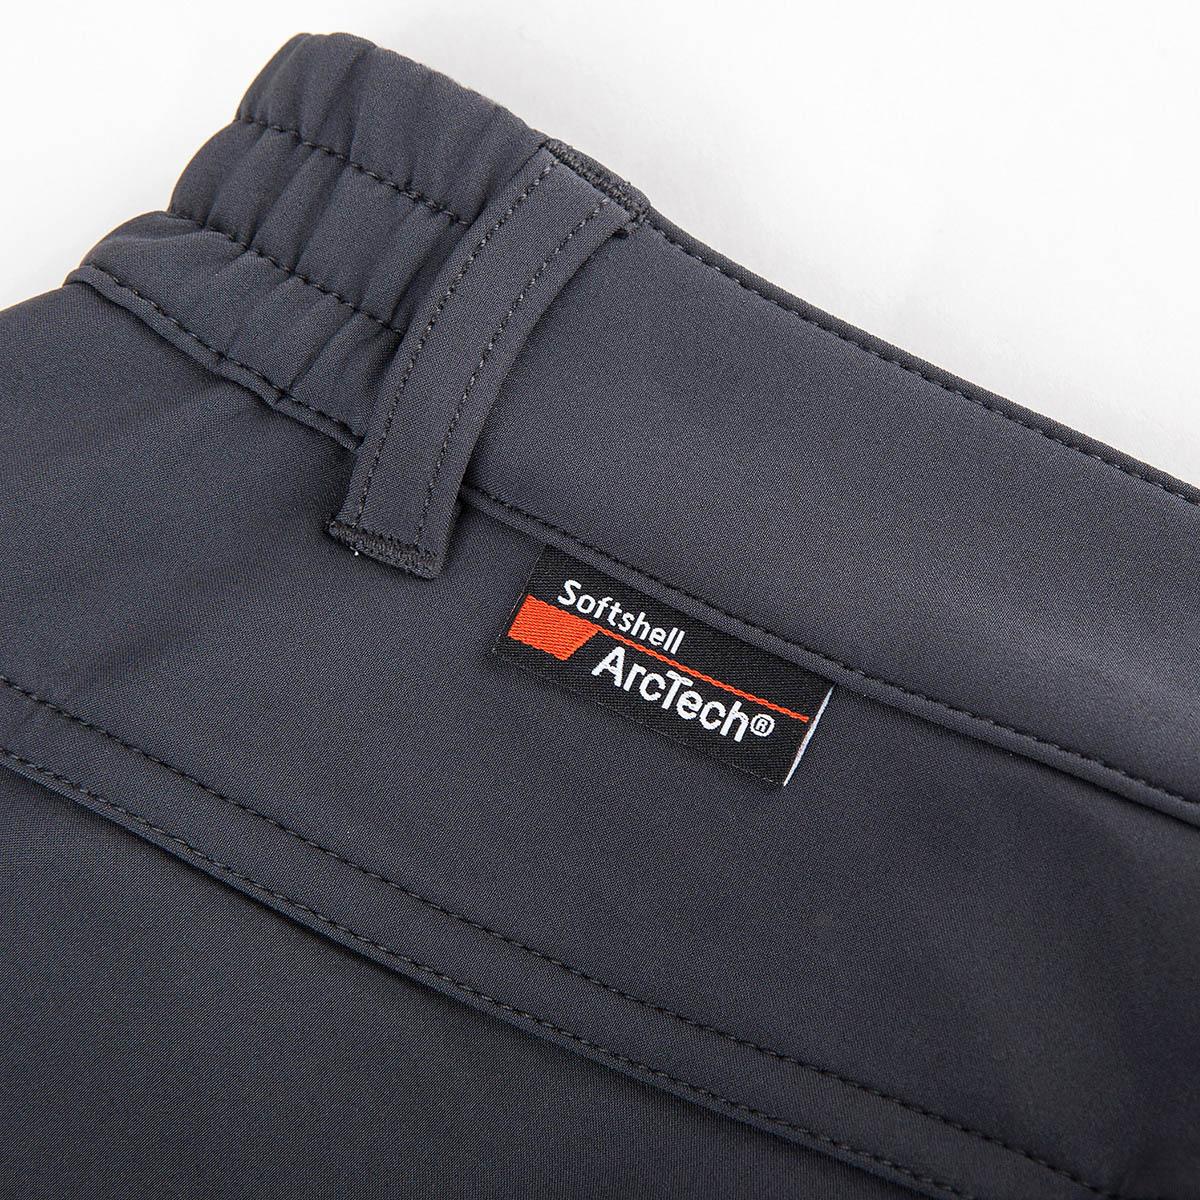 极星户外男软壳裤秋冬保暖防风软壳裤AGPC21217AGPC22218